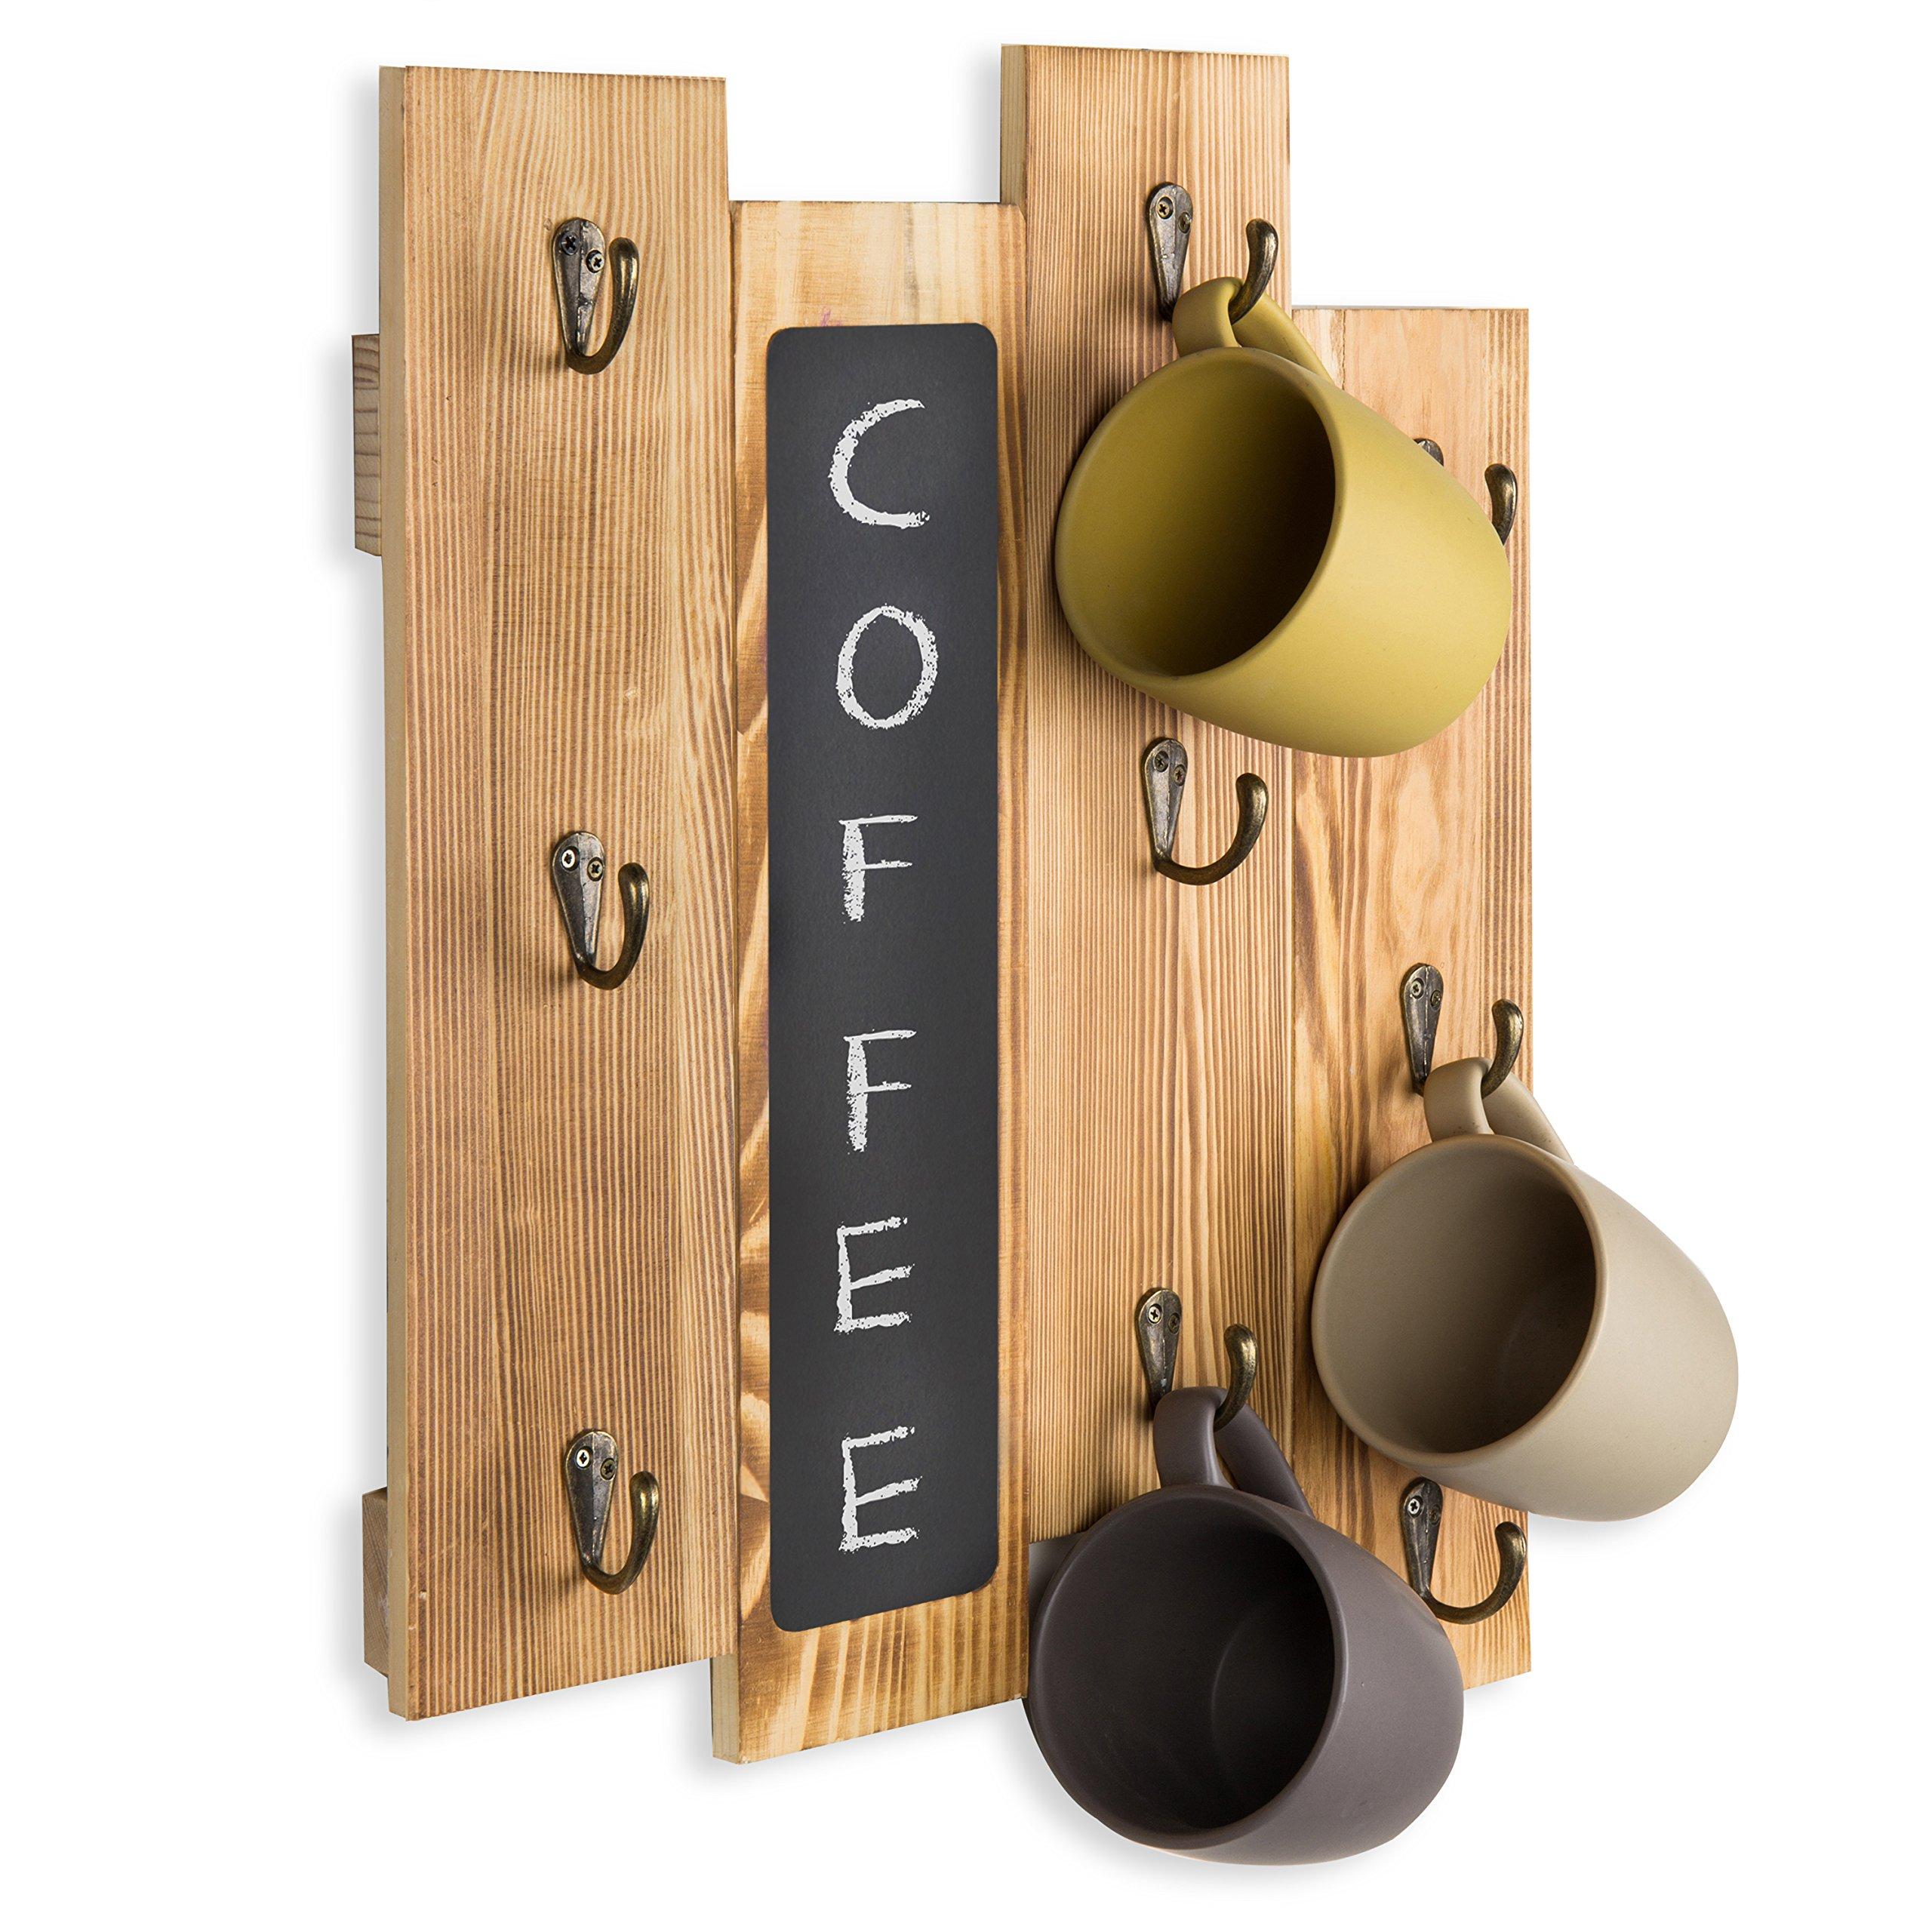 MyGift 9 个挂钩扭锁木壁挂式咖啡杯架带黑板